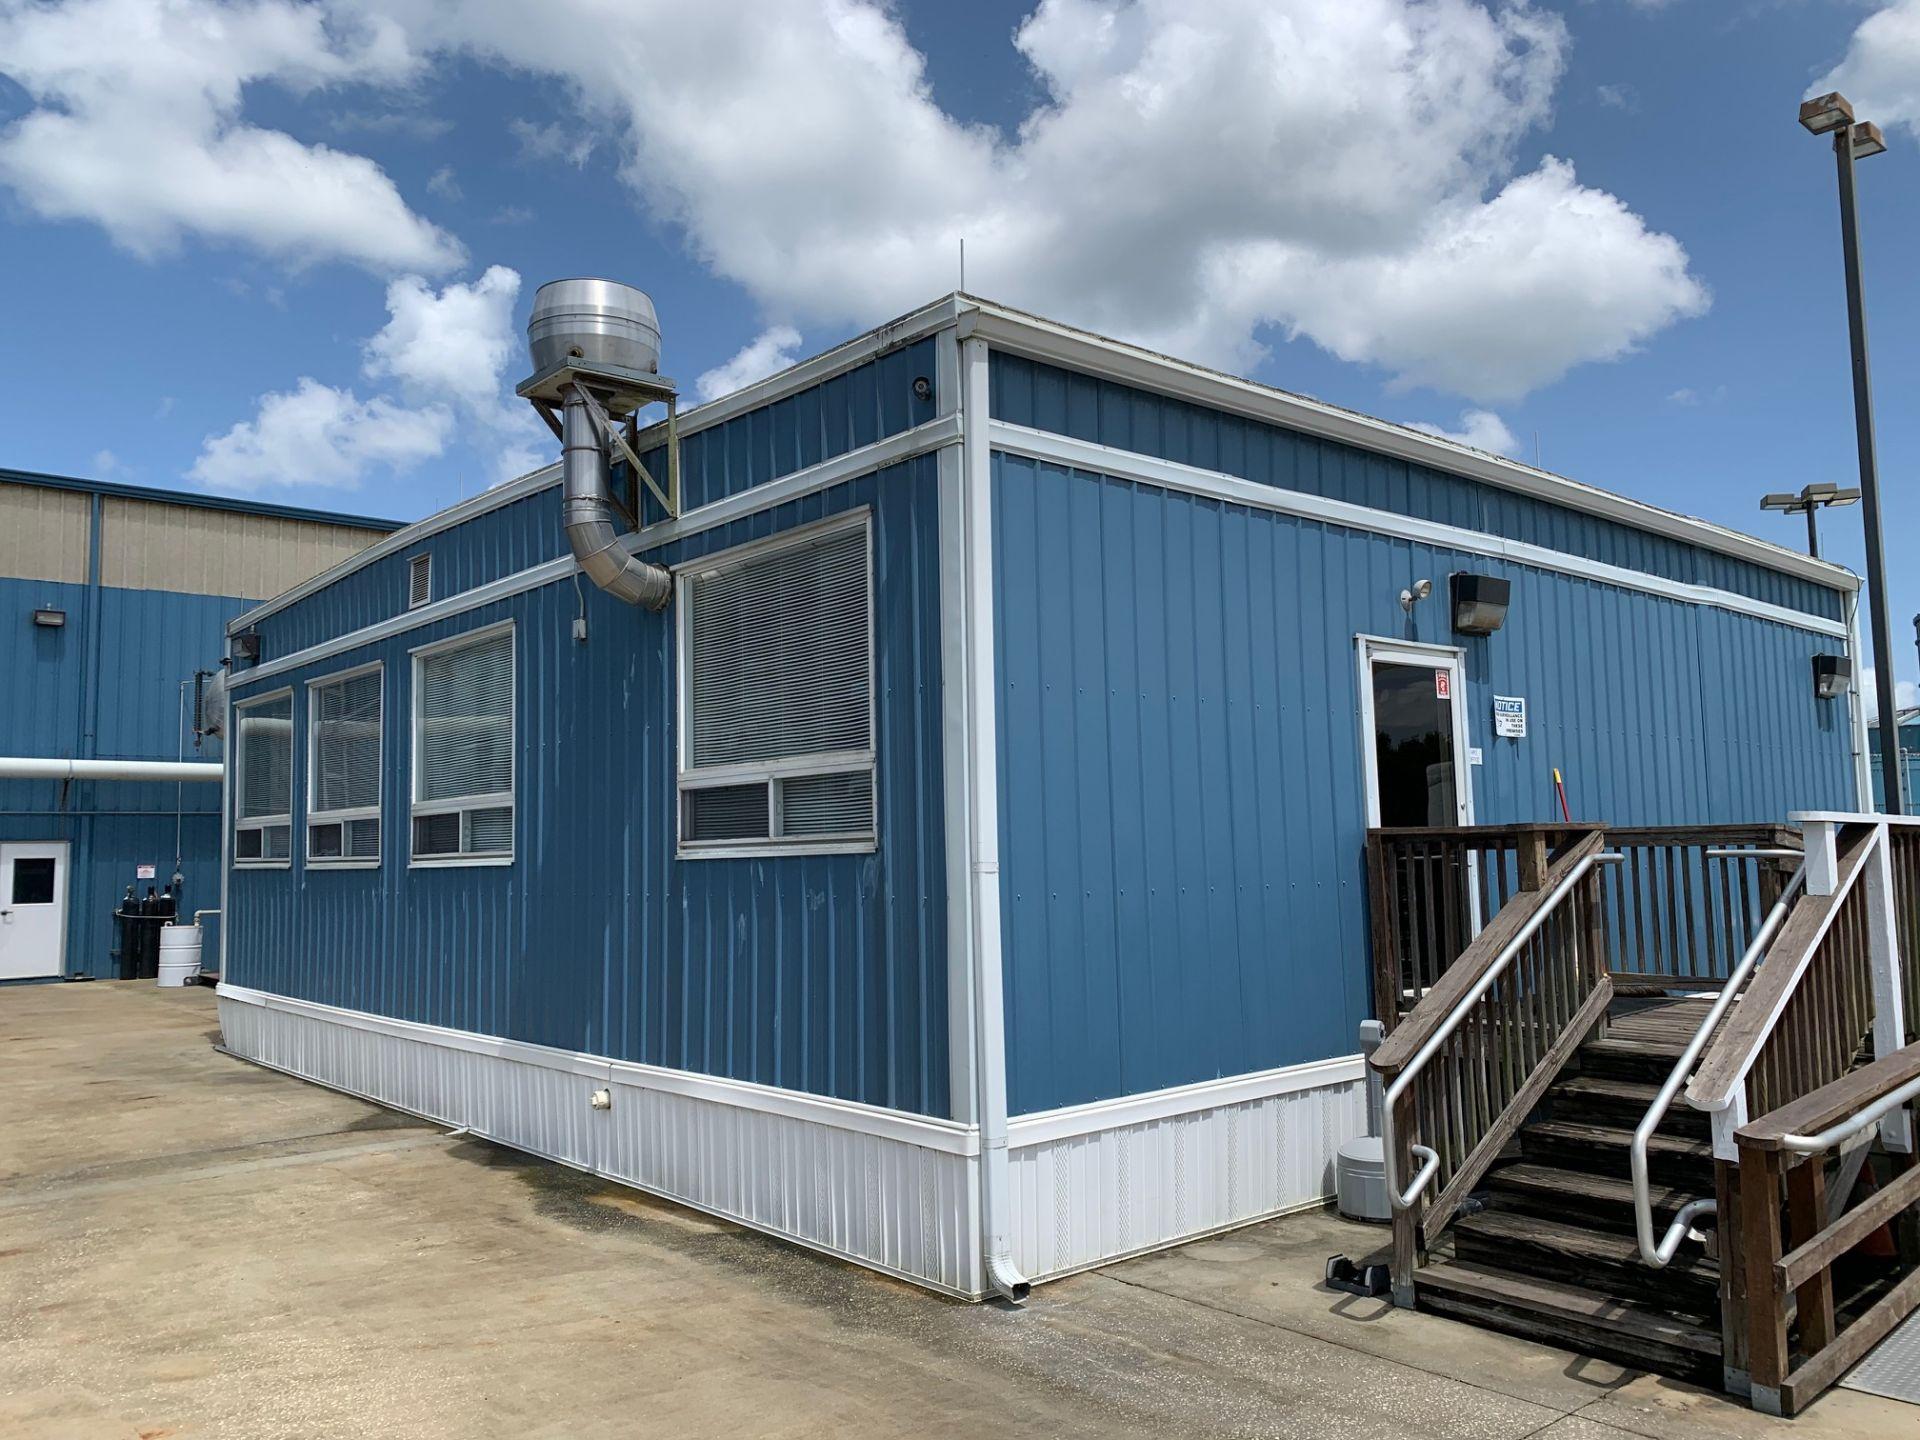 Lot 171 - 2013 24' X 48' portable building (office building) on steel skids, ADA compliant bathroom, (3)